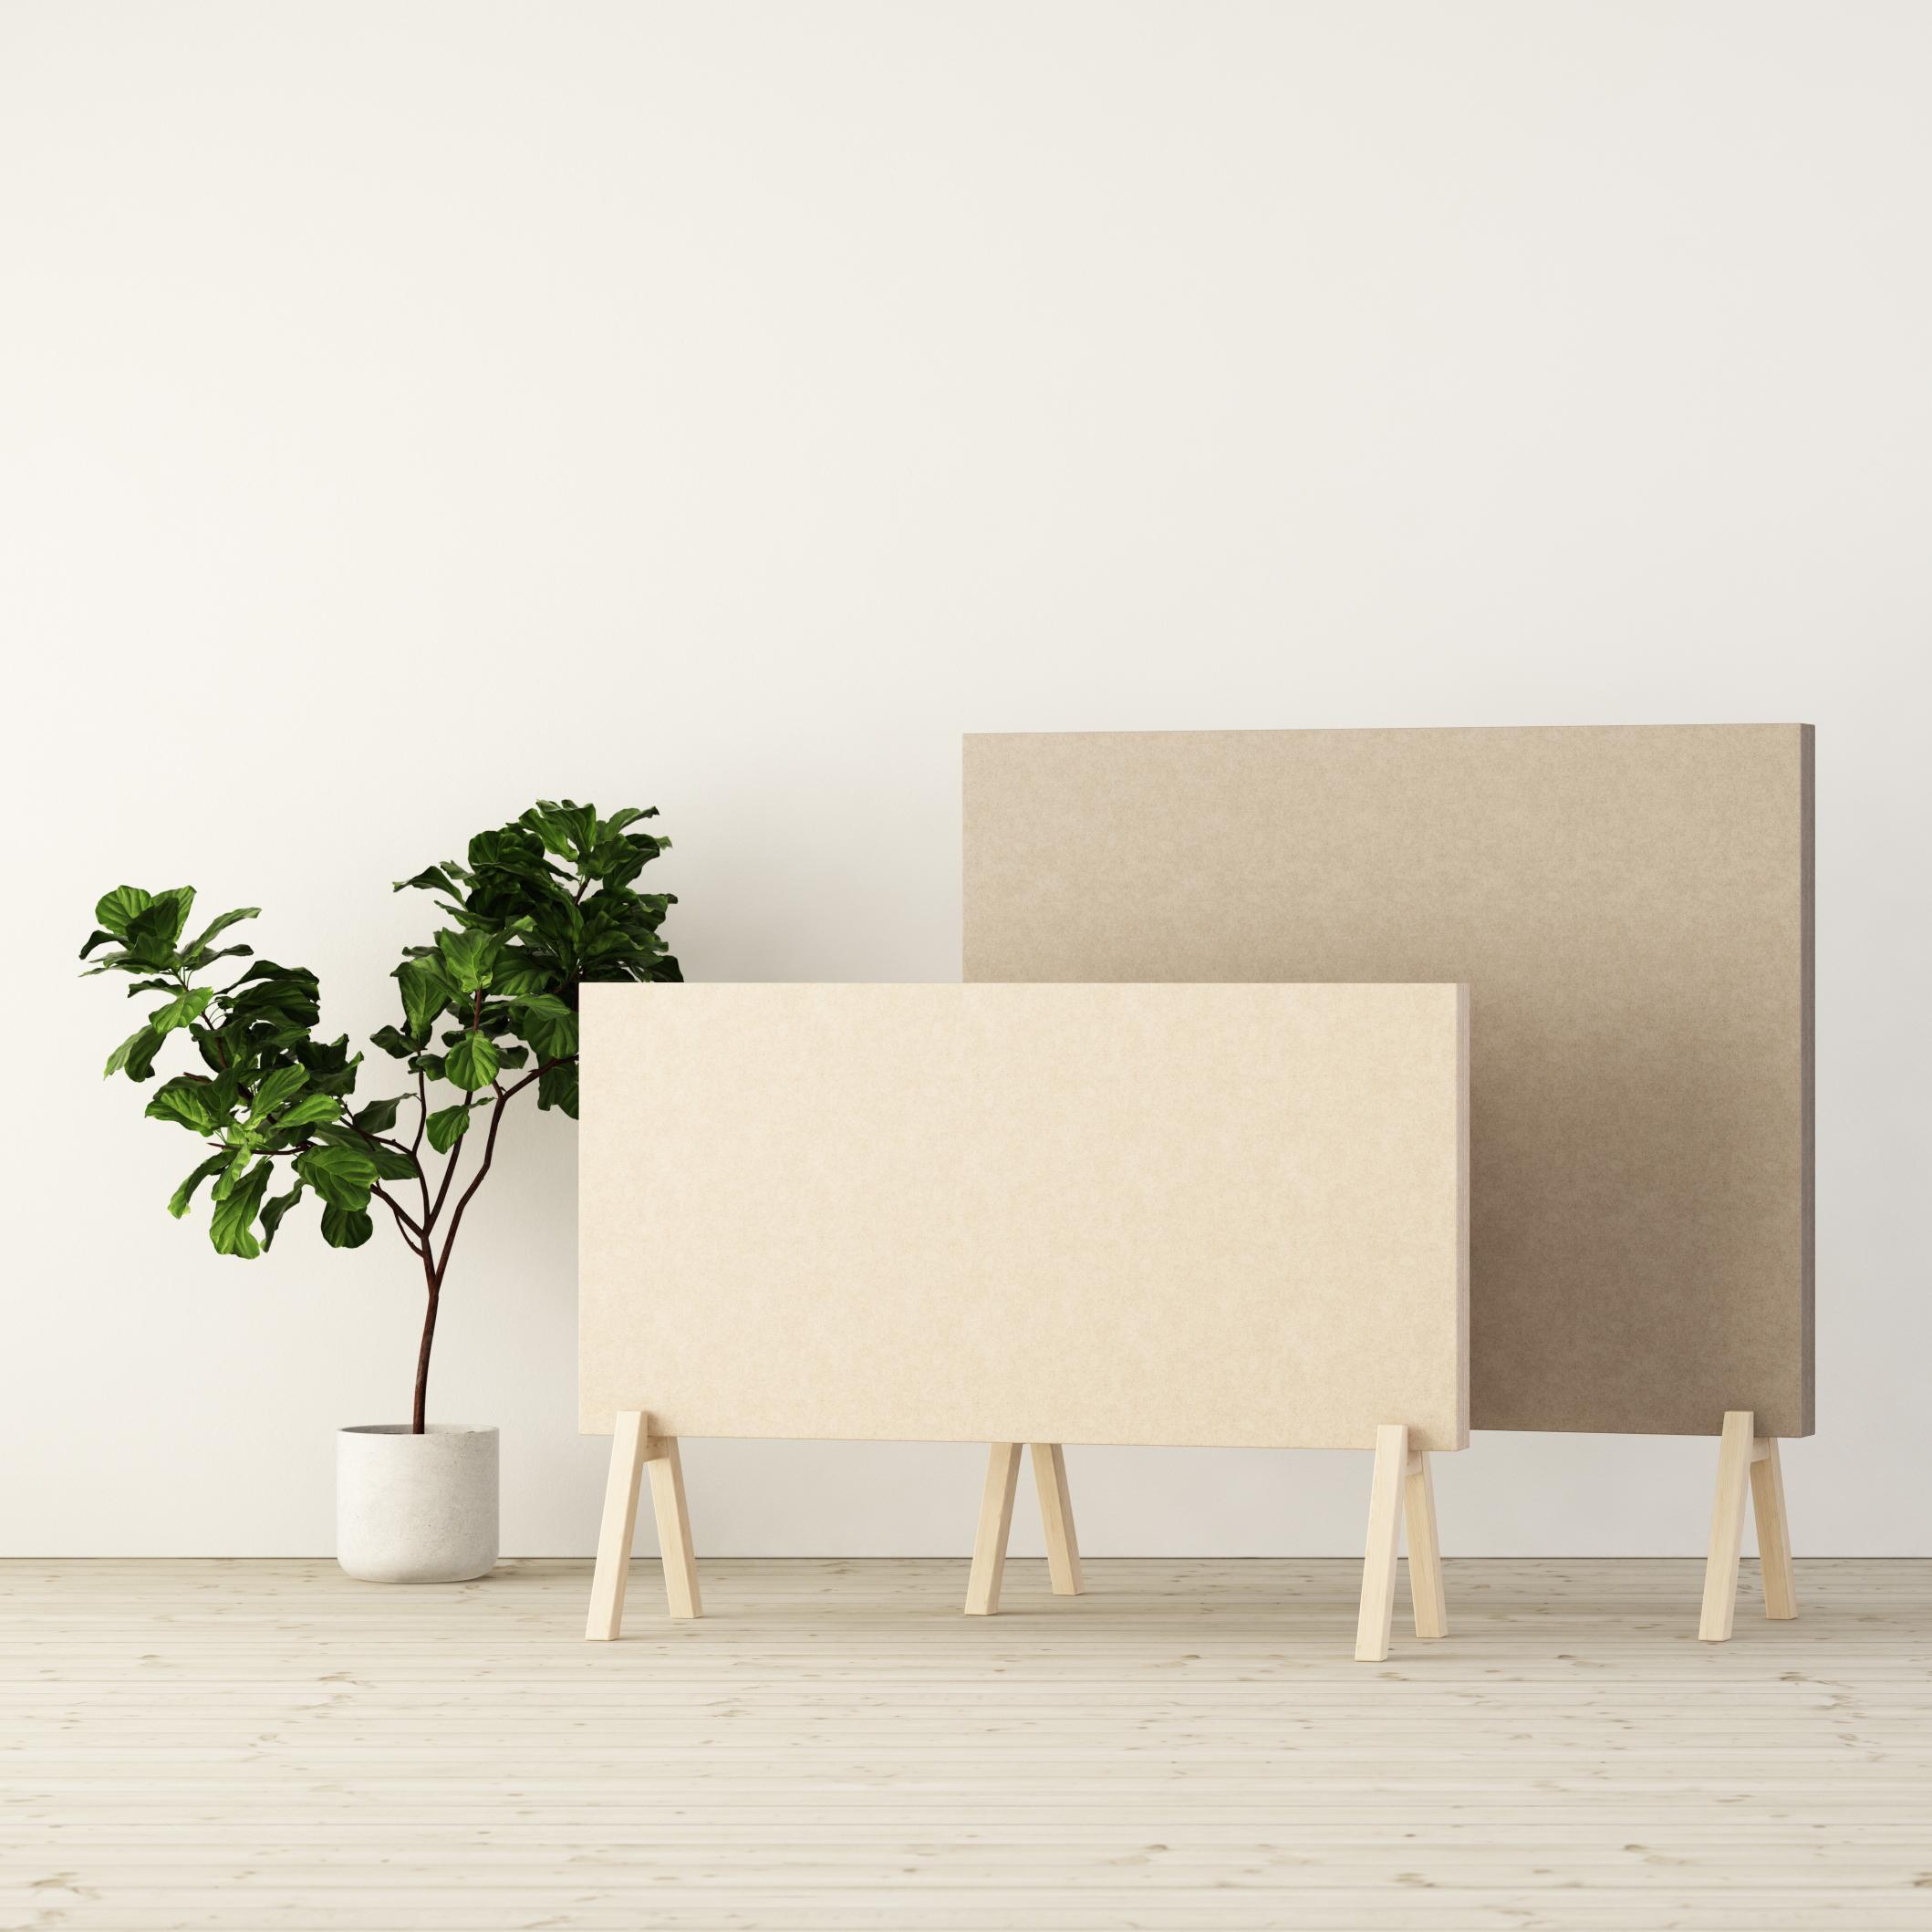 Limbus Subtle, floor screens by Glimakra of Sweden 2017, design Johan Kauppi